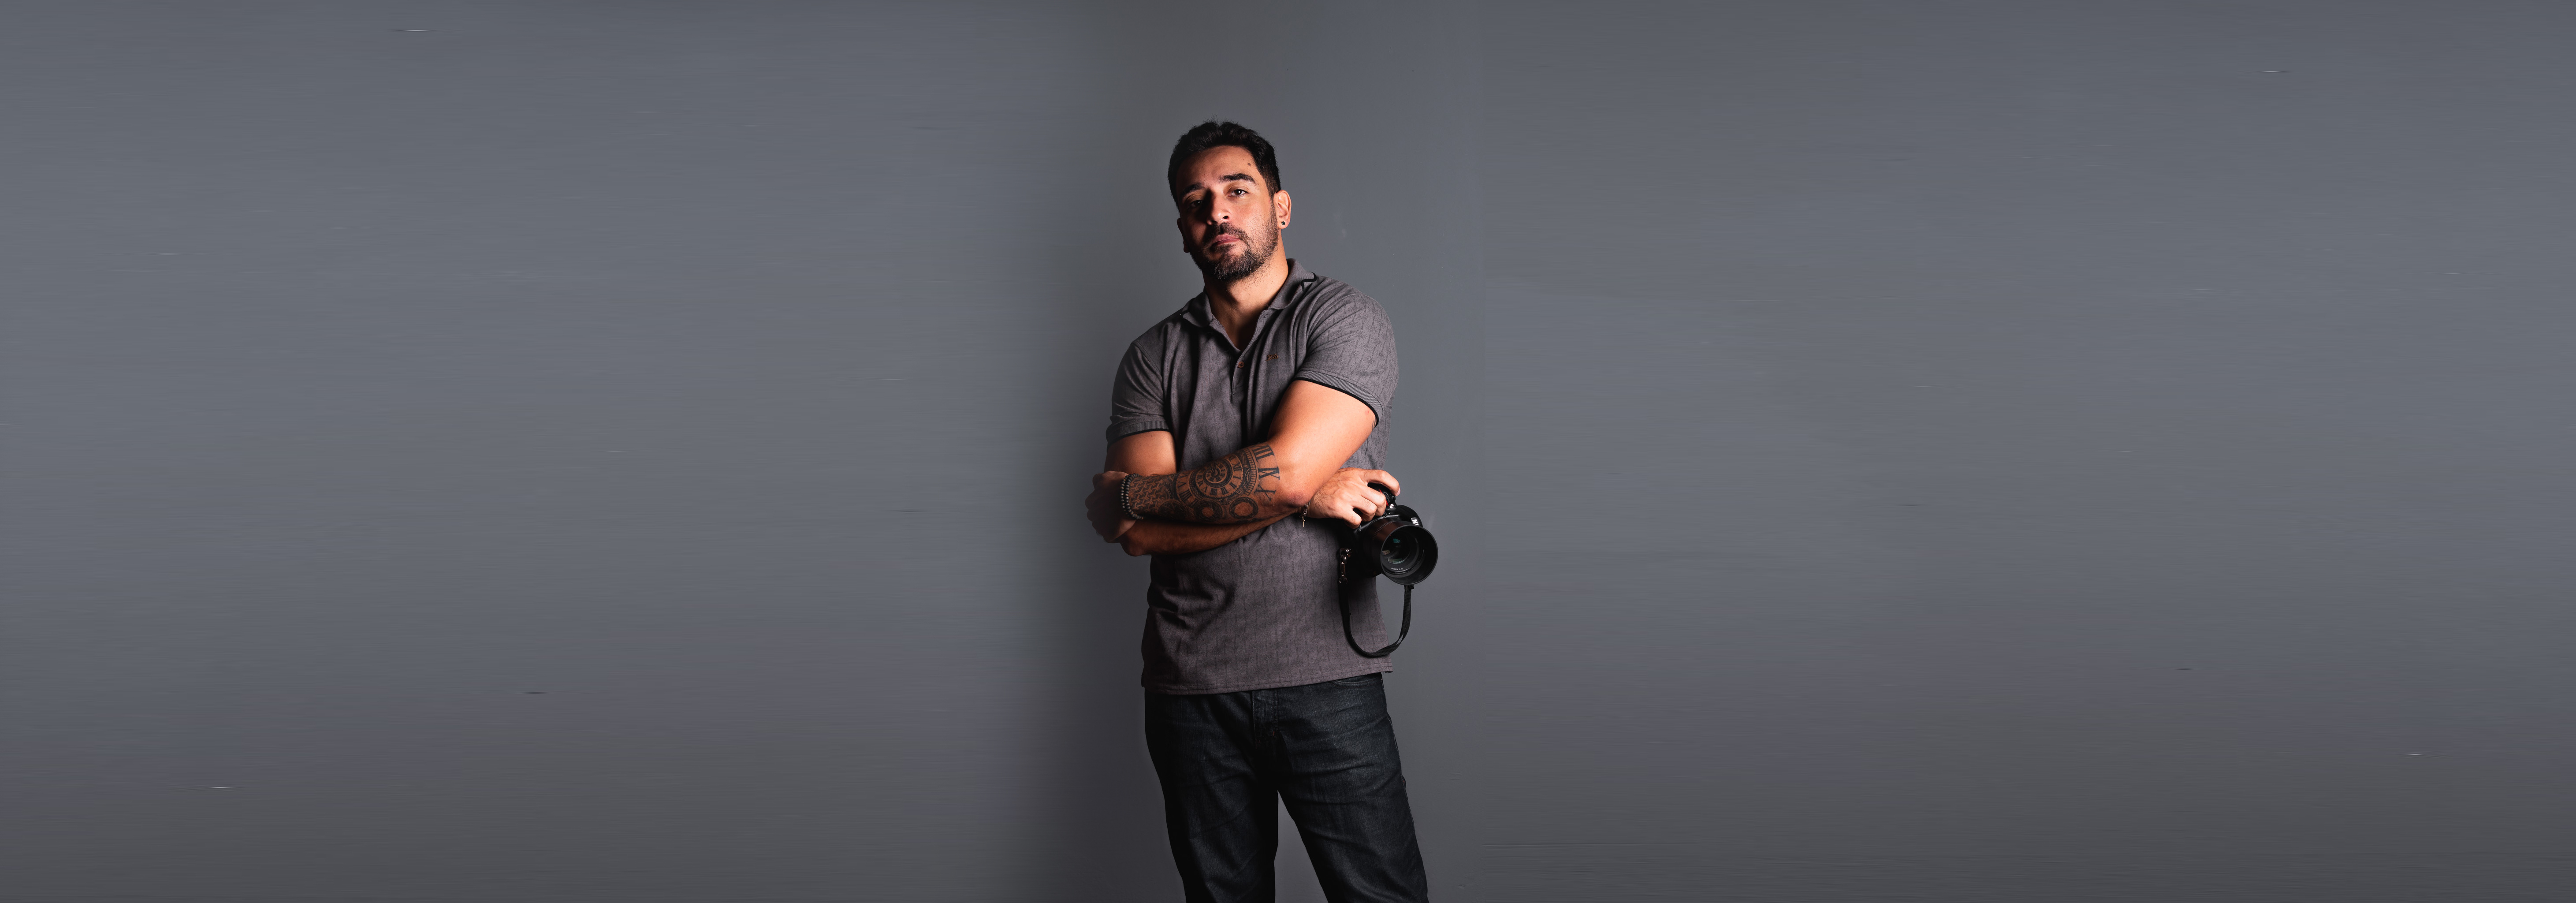 Sobre DANIEL SANTOS | Fotógrafo apaixonado por retrato, moda, casamento e publicidade - Guaratinguetá/SP